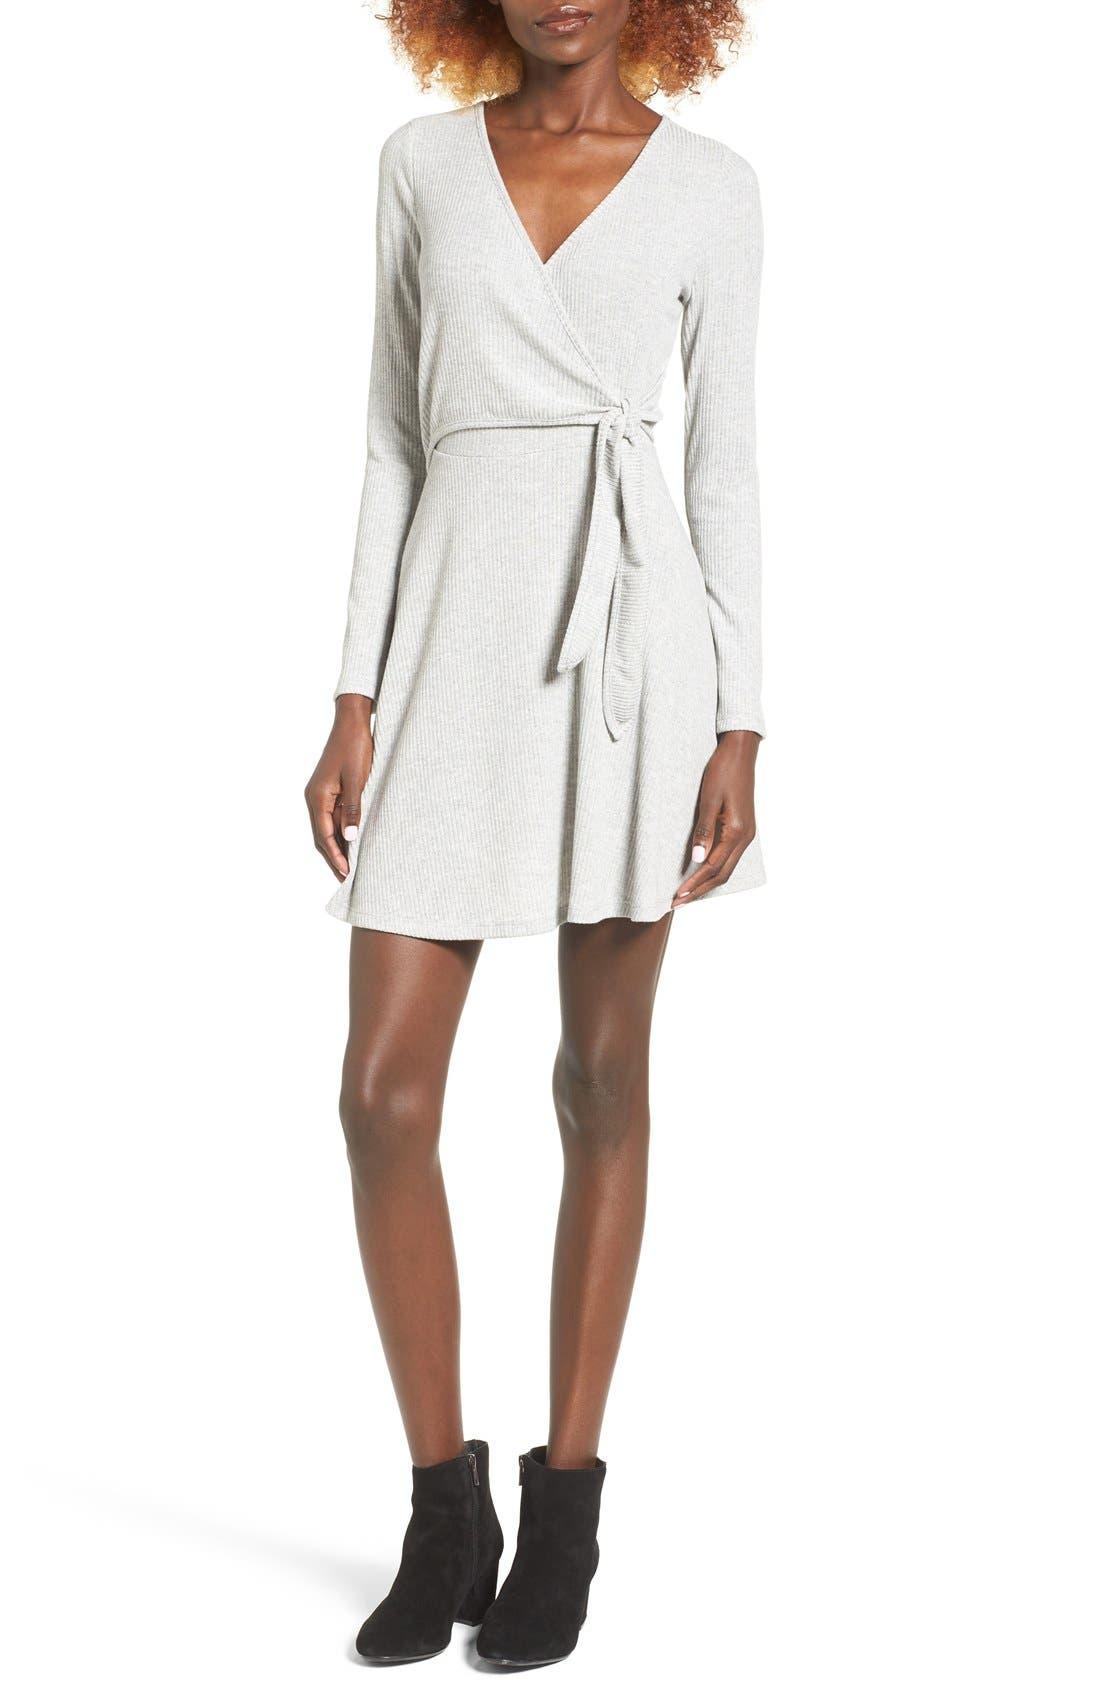 Main Image - Everly Rib Knit Wrap Dress